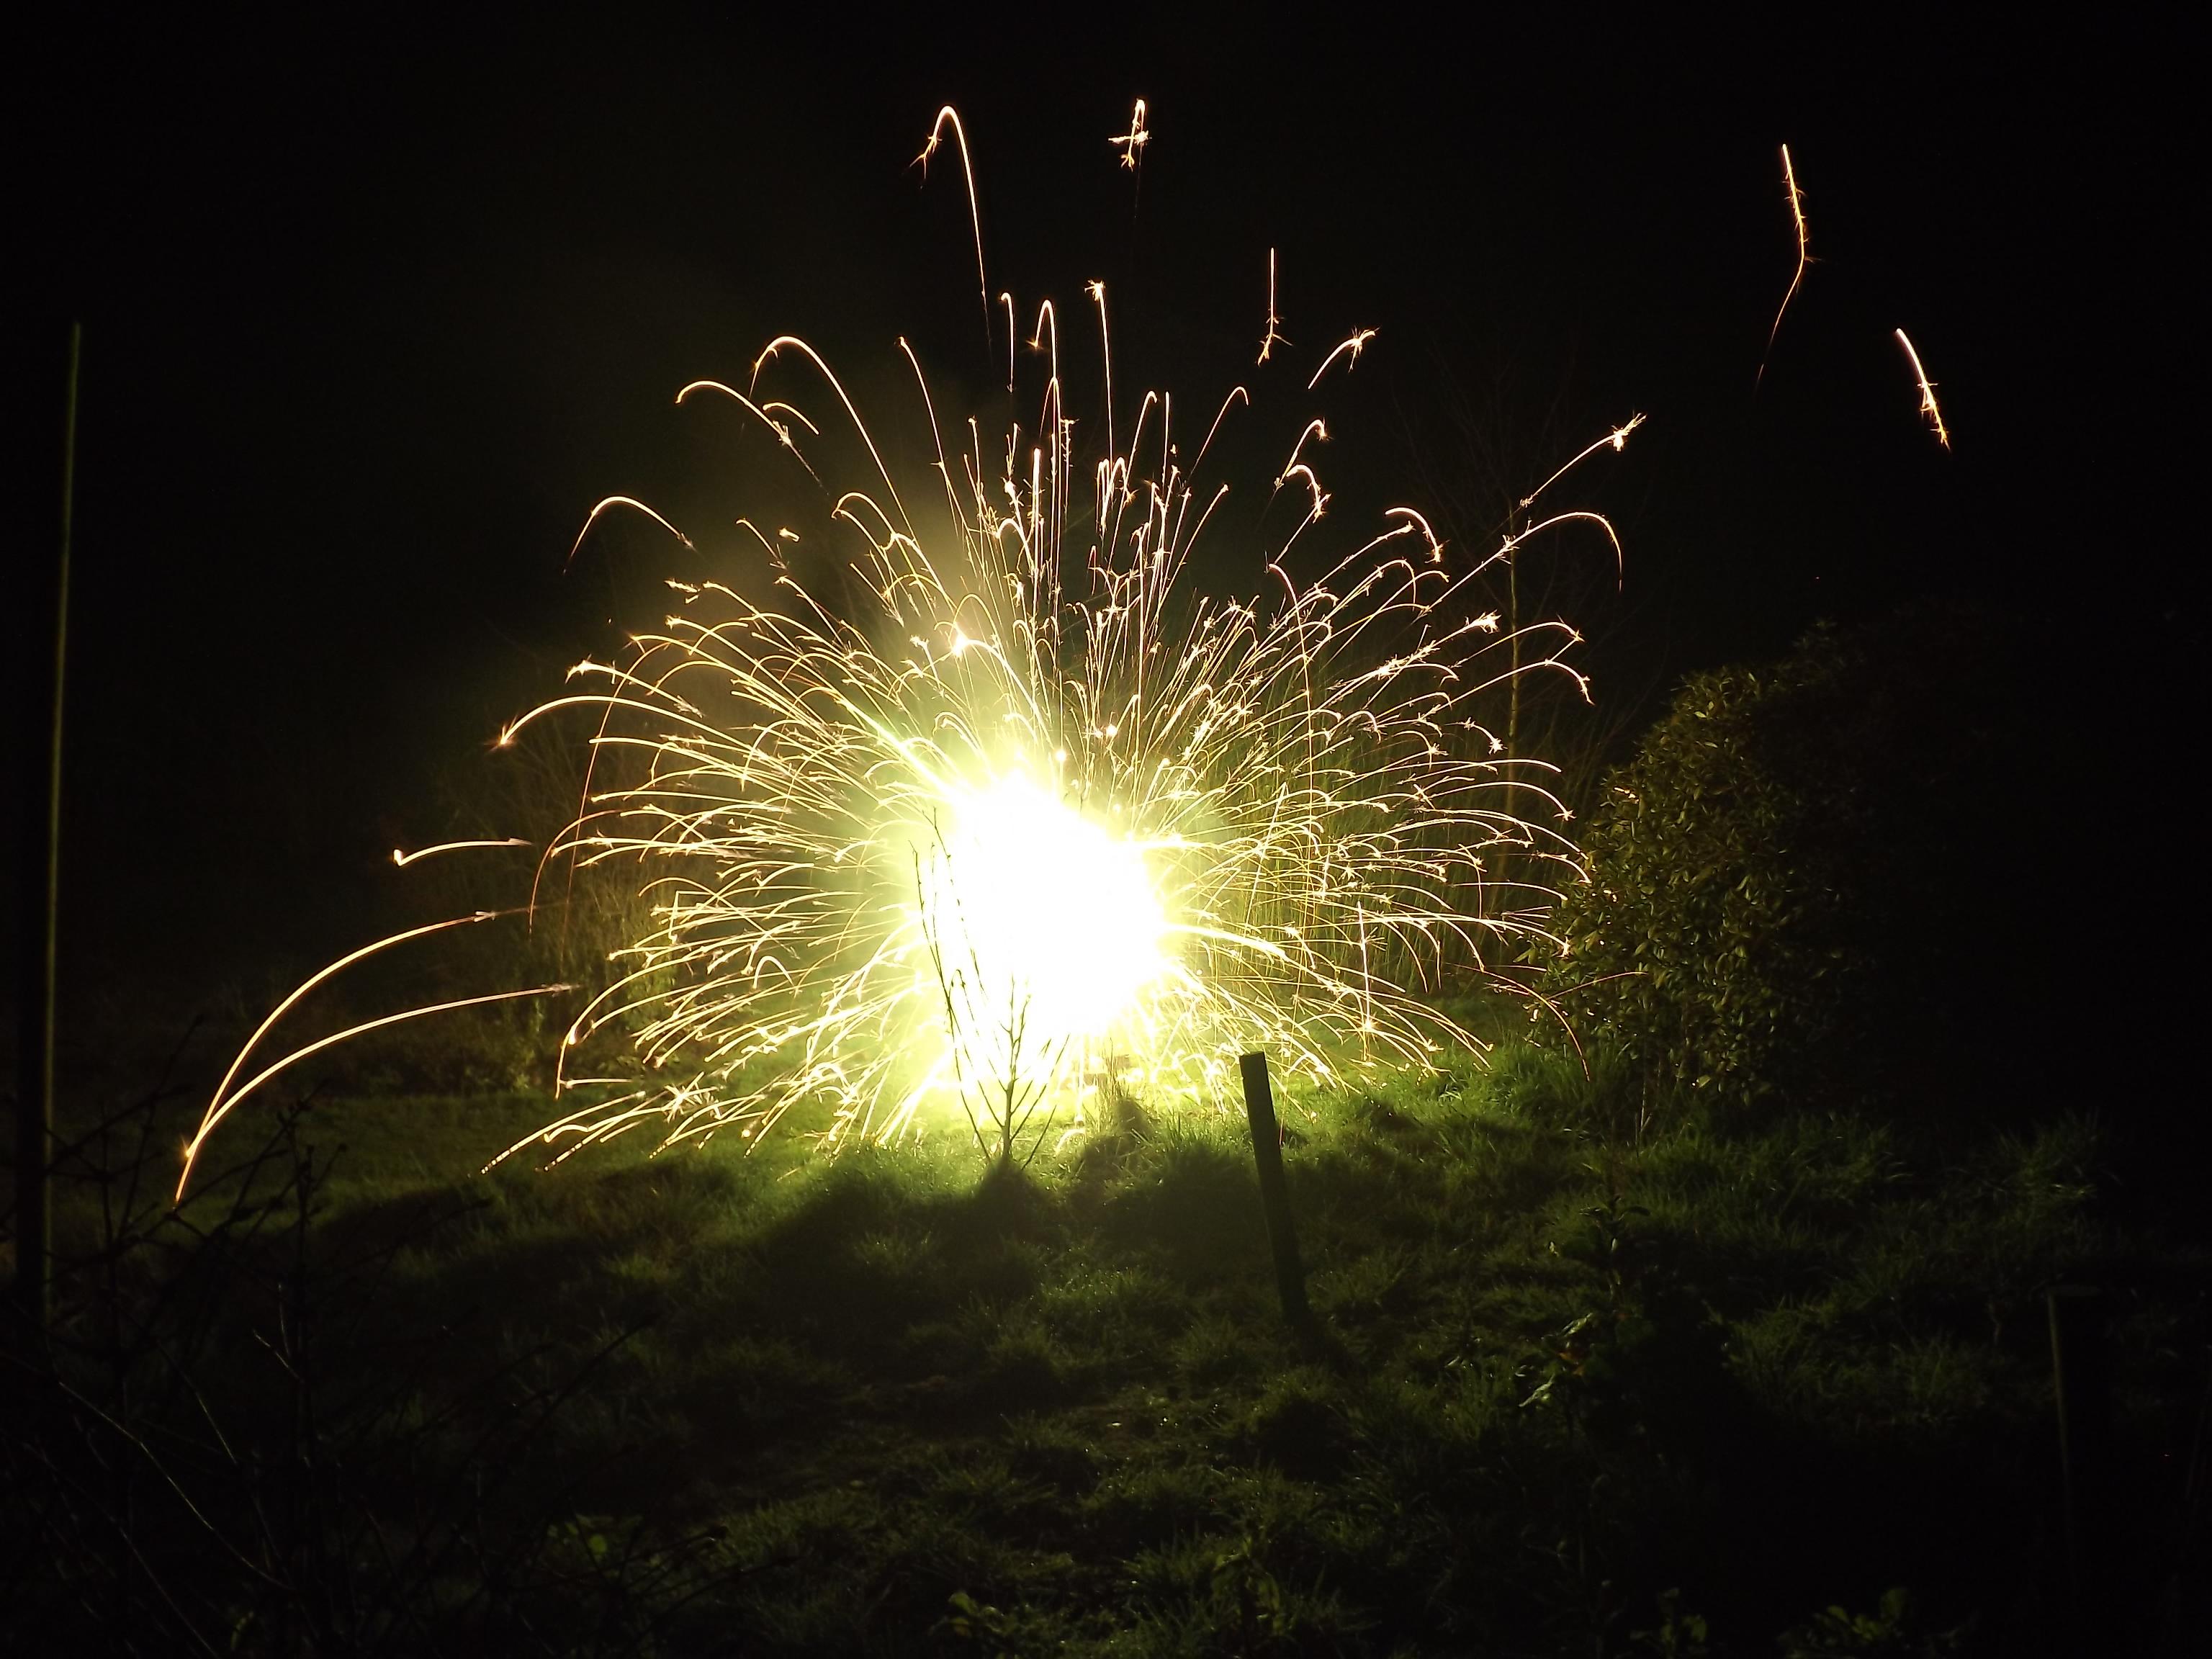 feuerwerk-grosse-explosion-boden-4543